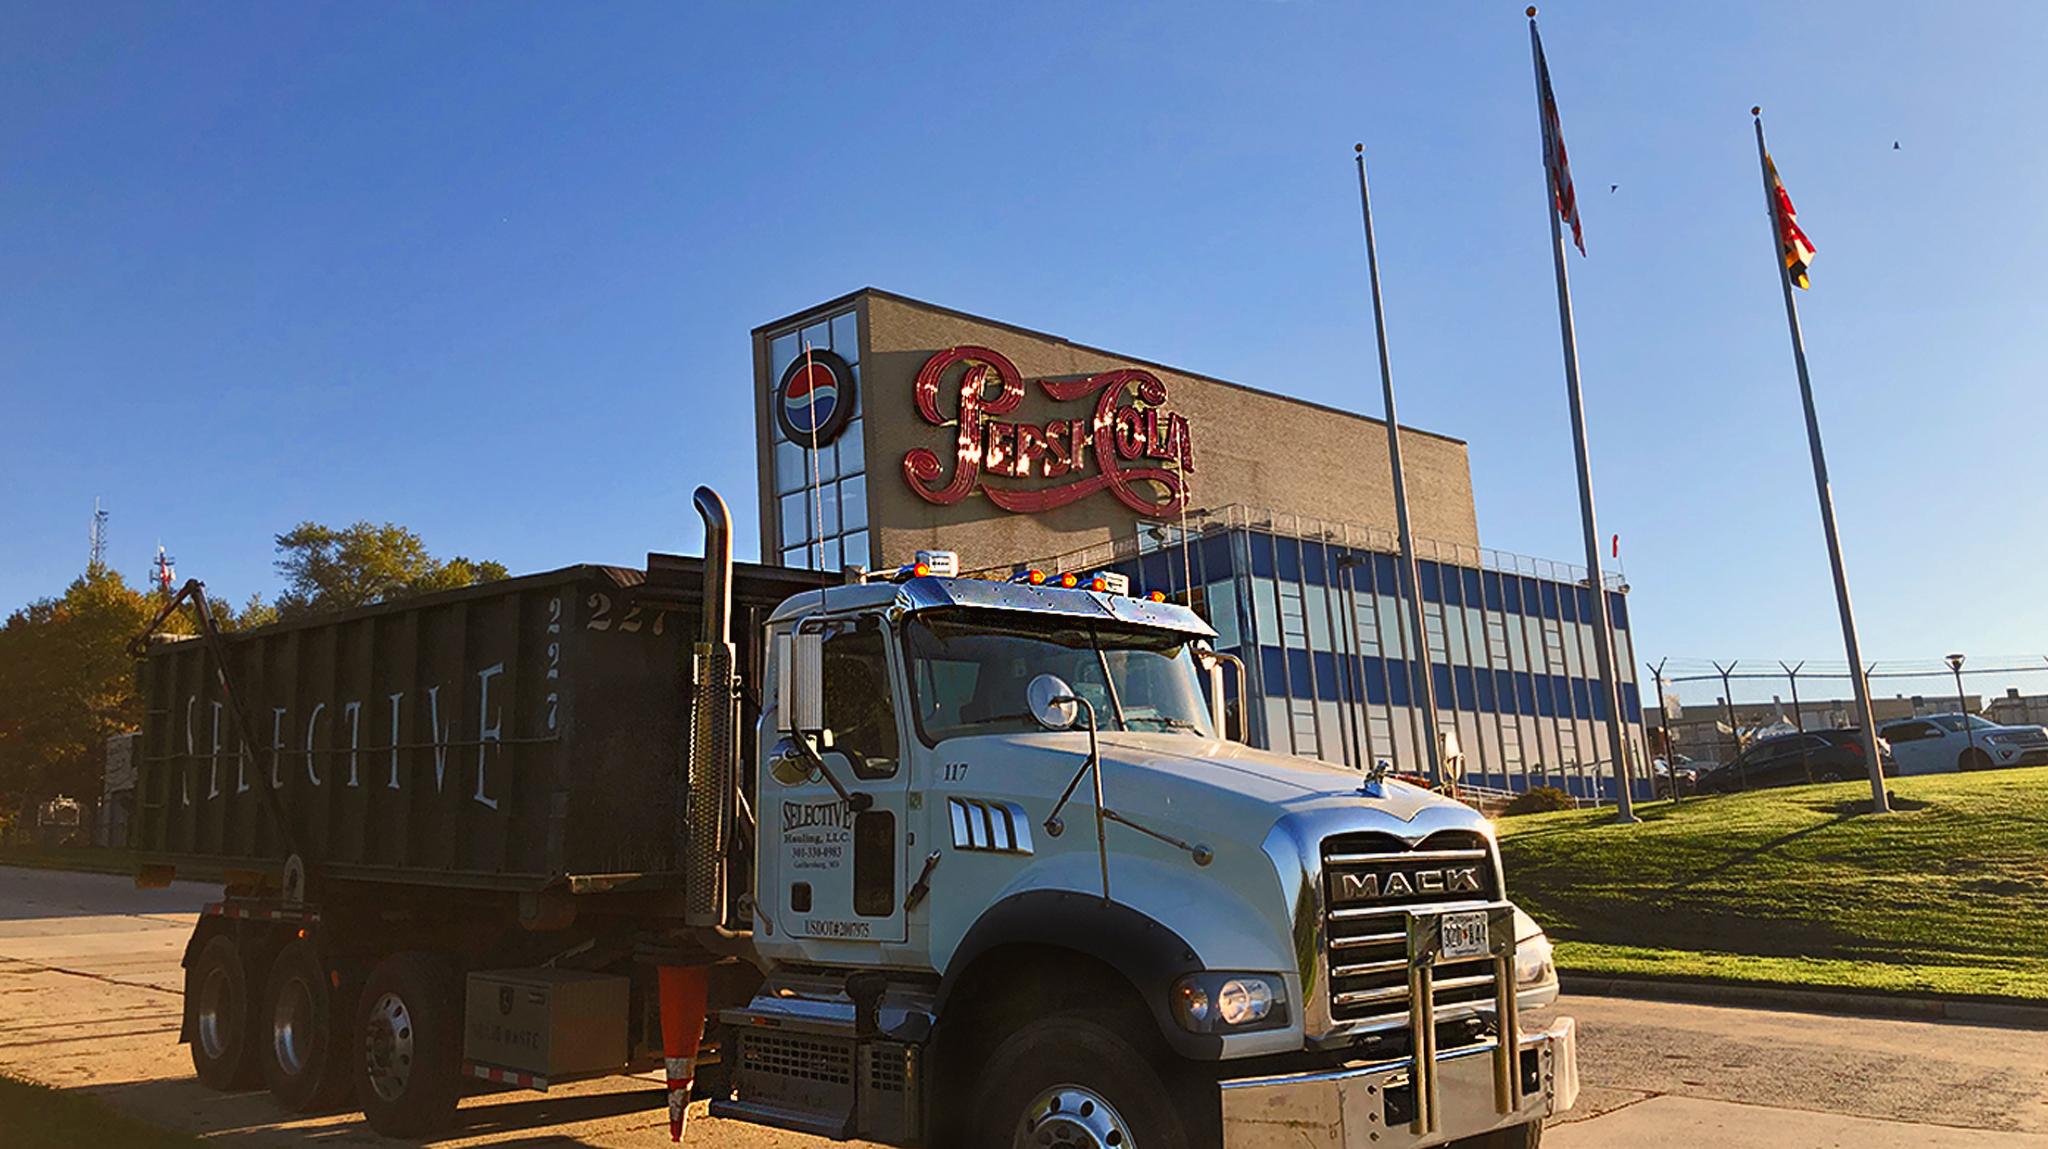 Roll off dumpster rental Fairfax VA - Fairfax Dumpster Rental